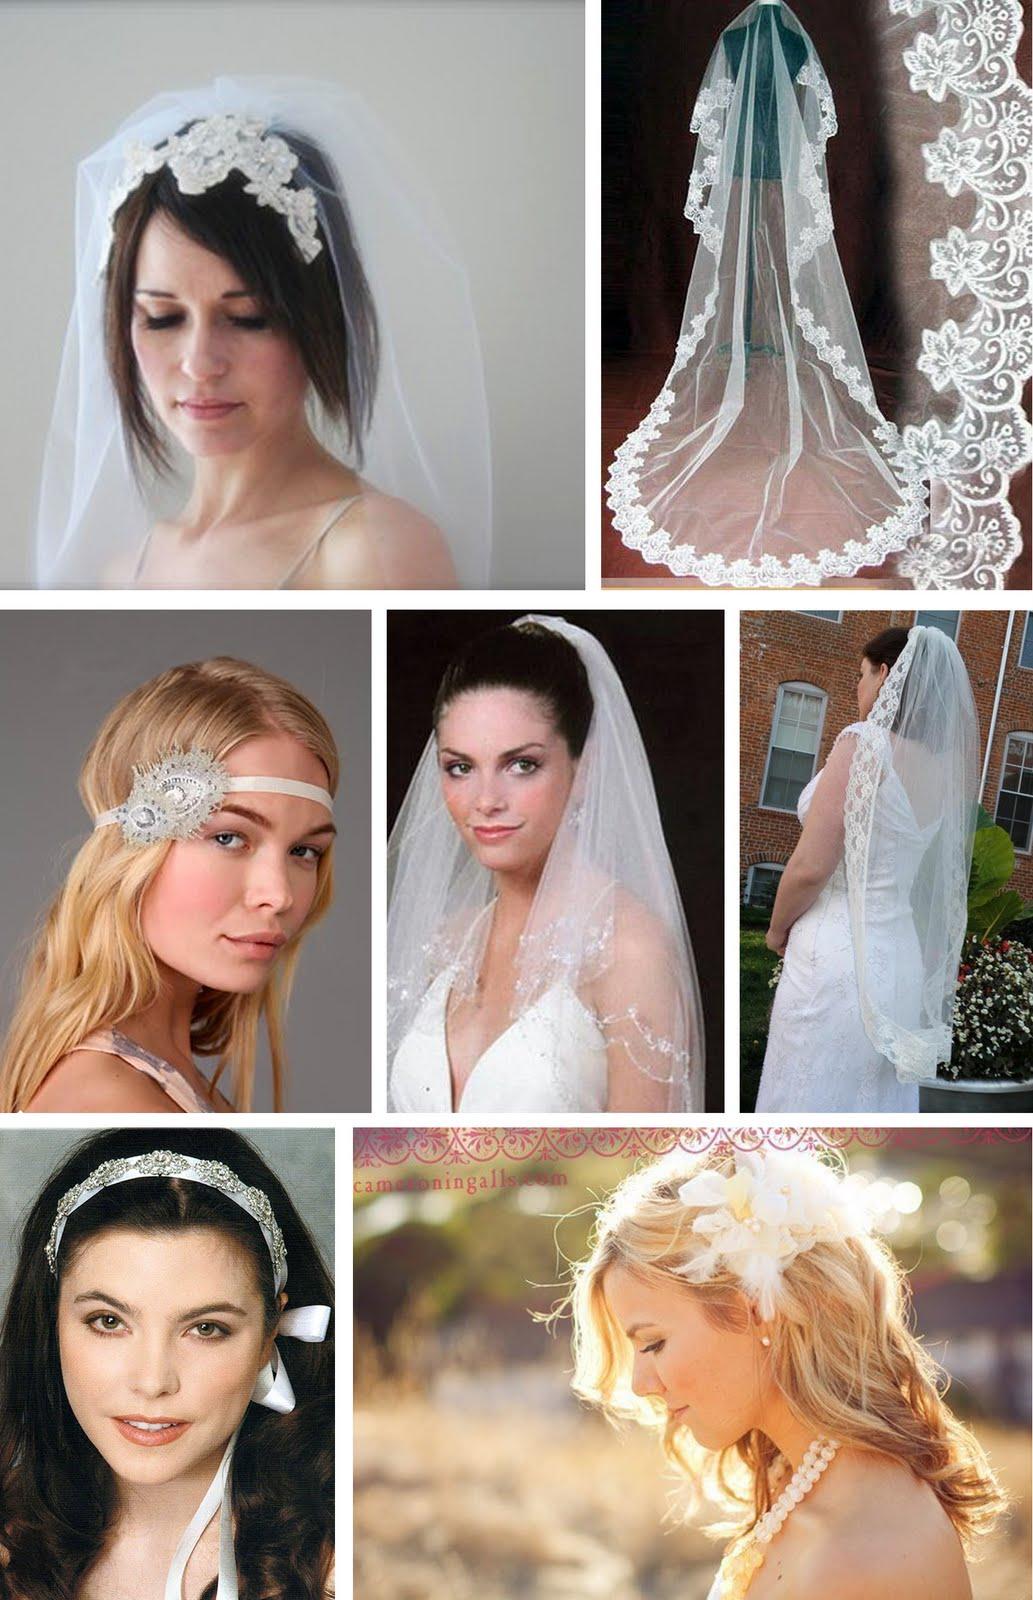 the artful bride wedding blog: wedding veils & hair accessories